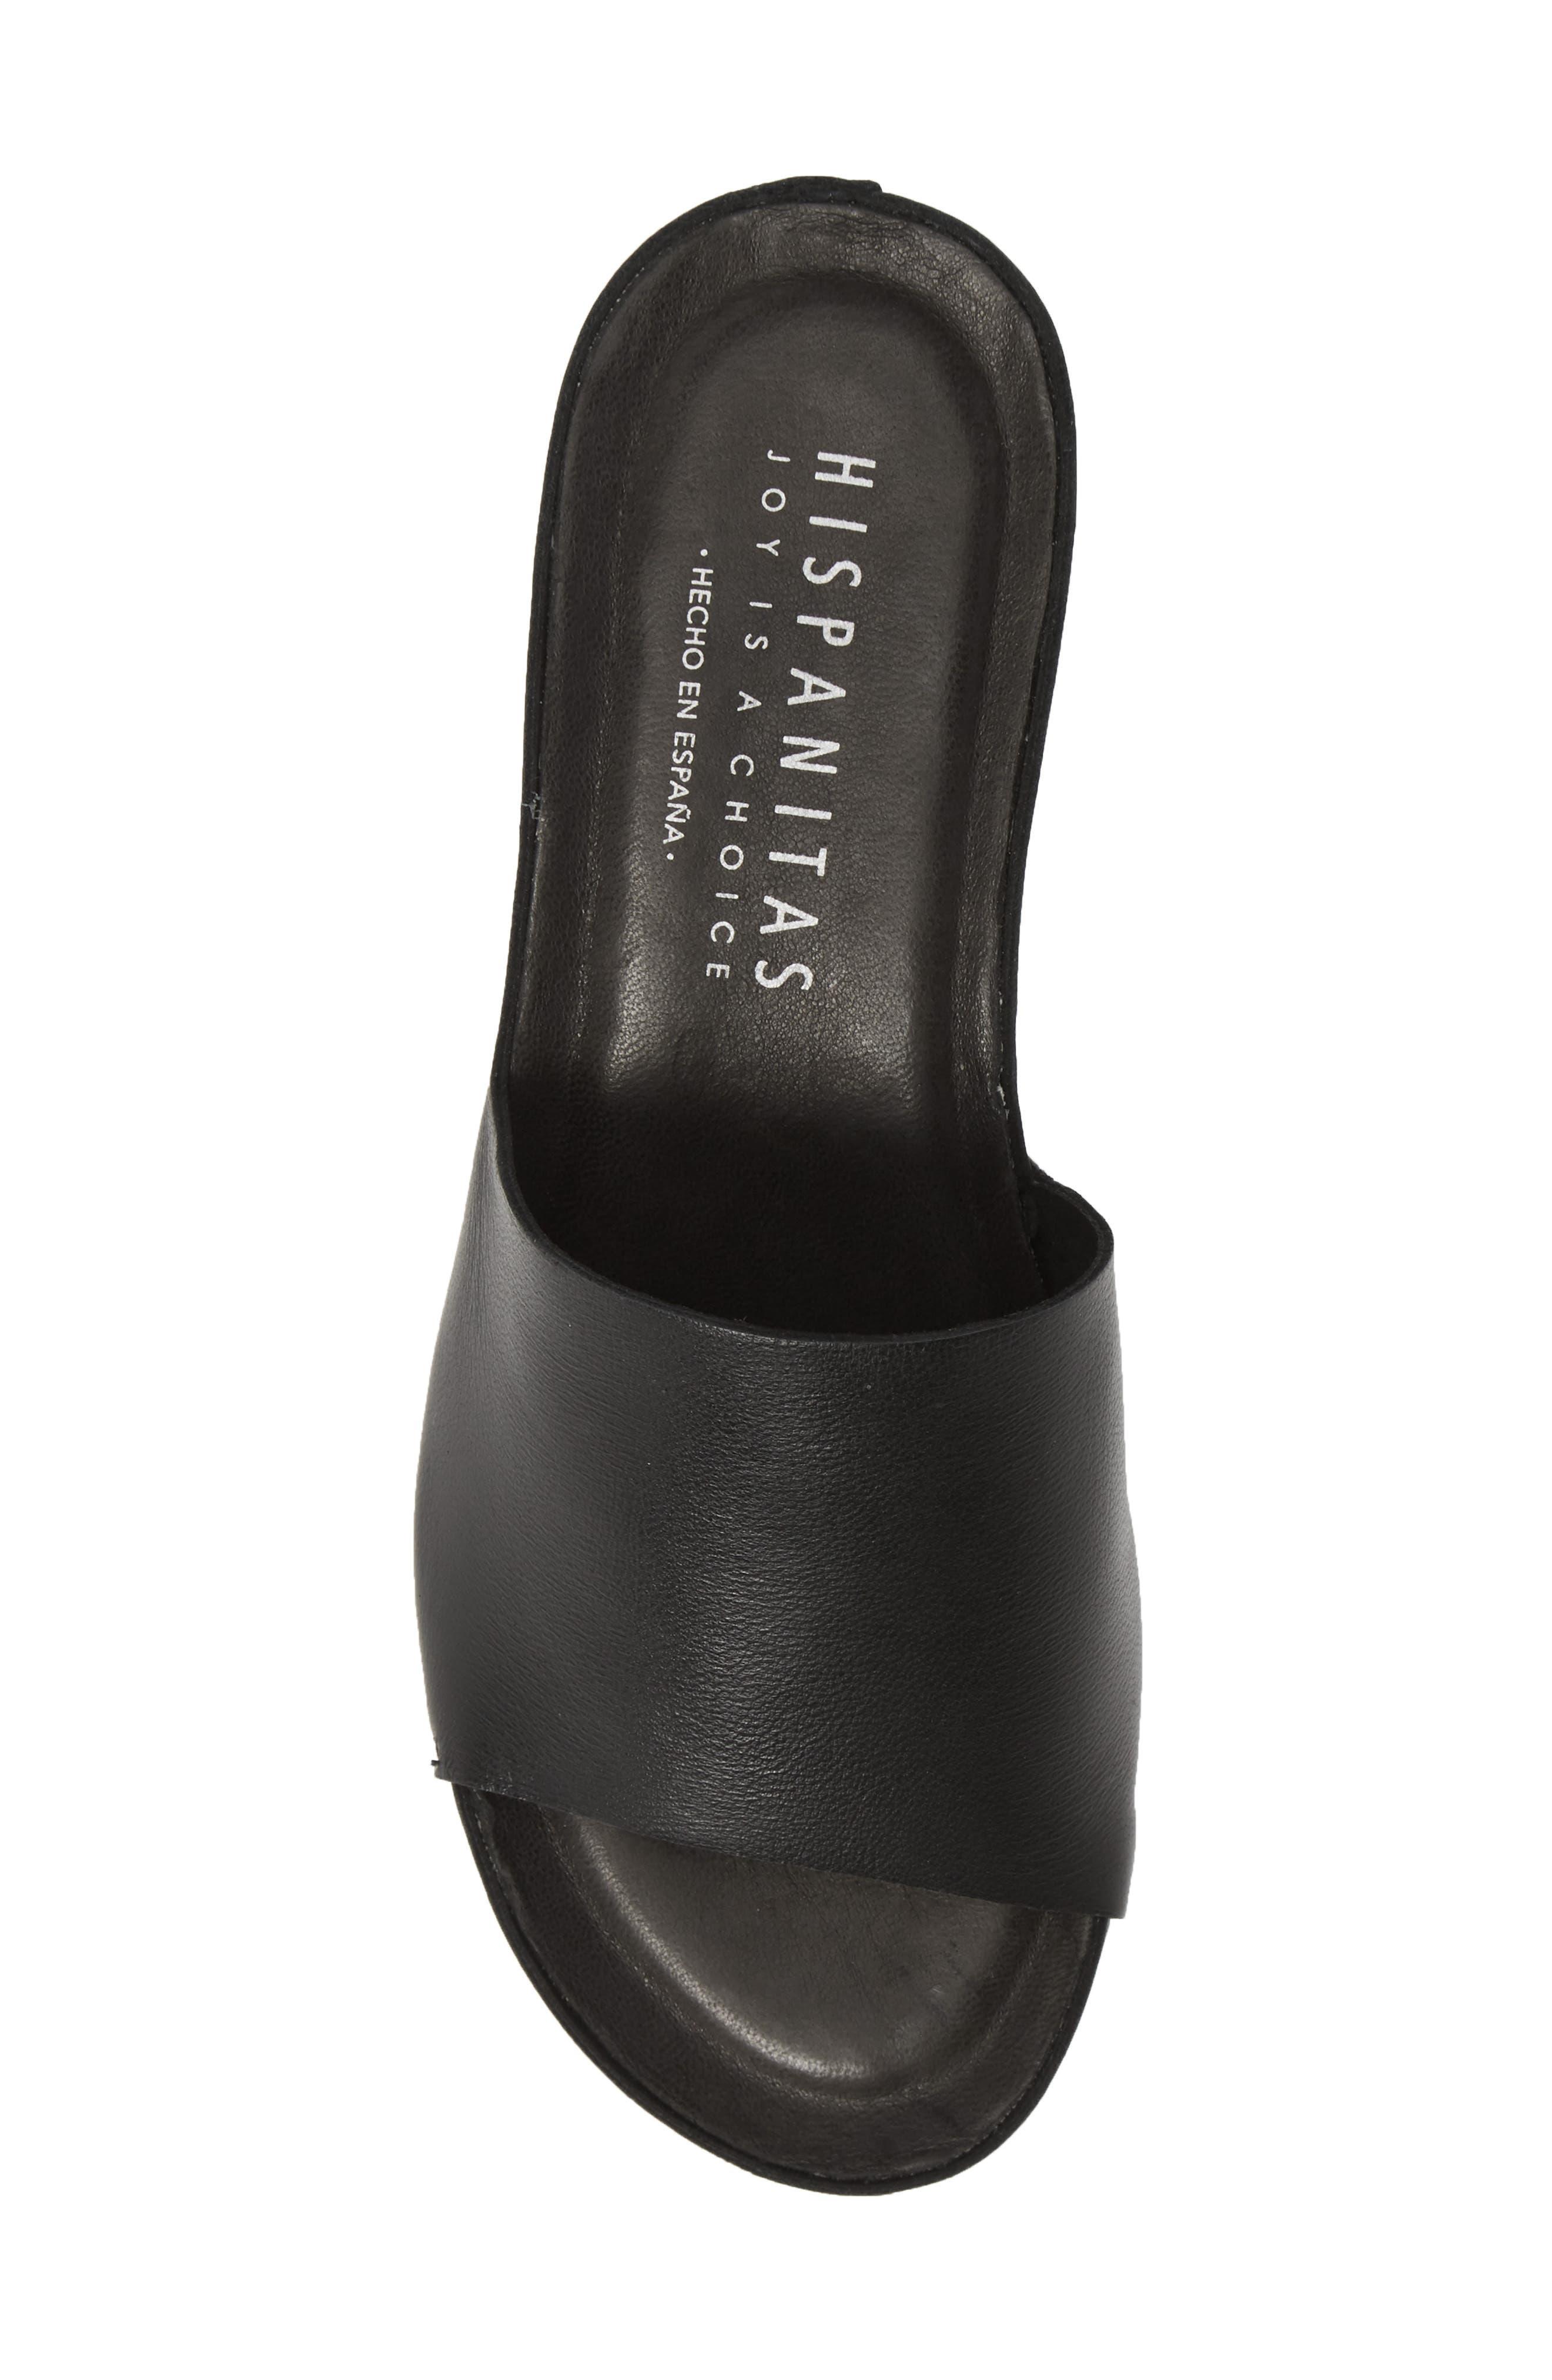 HISPANITAS, Vega Slide Sandal, Alternate thumbnail 5, color, BLACK LEATHER